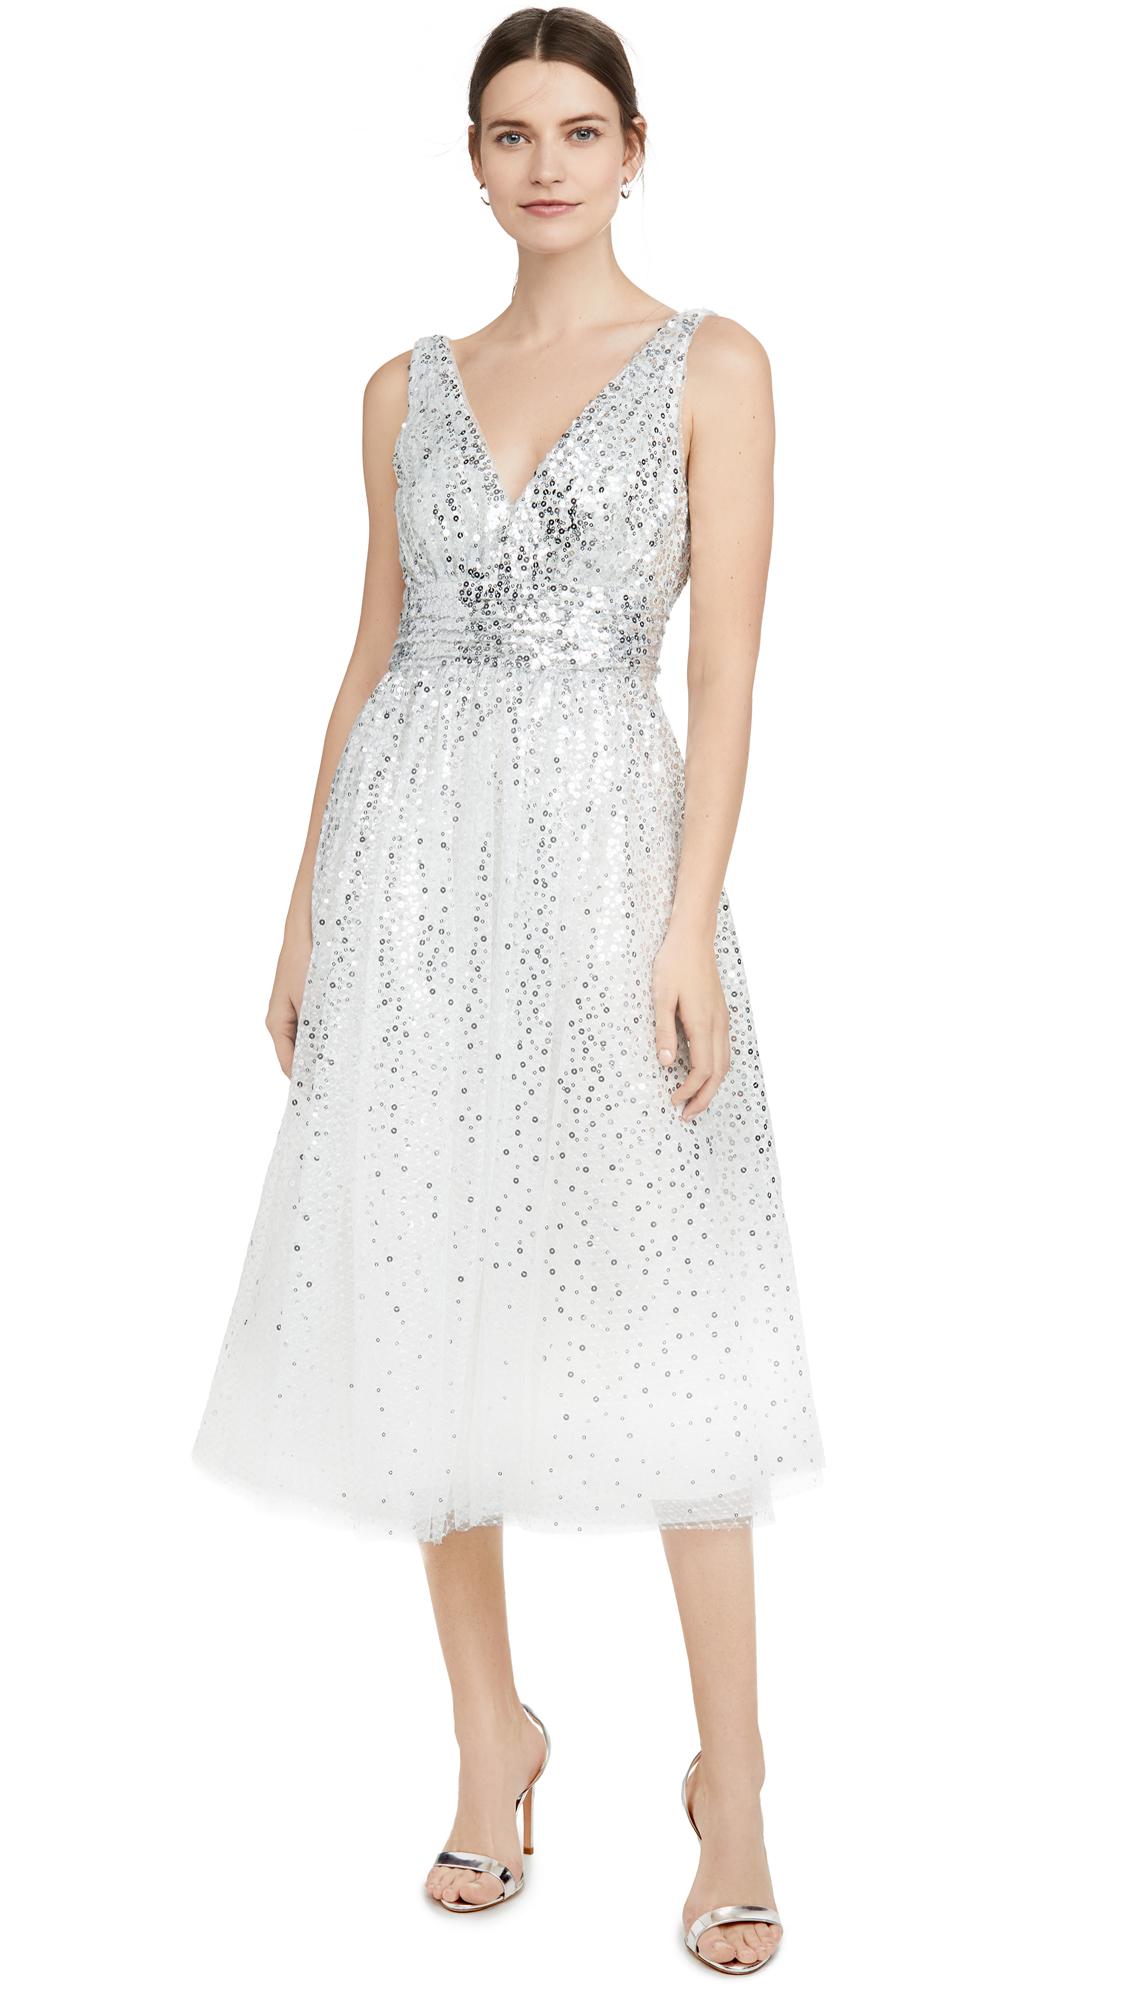 Buy Marchesa Notte Sleeveless V Neck Degrade Sequin Gown Tea Length online beautiful Marchesa Notte Dresses, Strapless